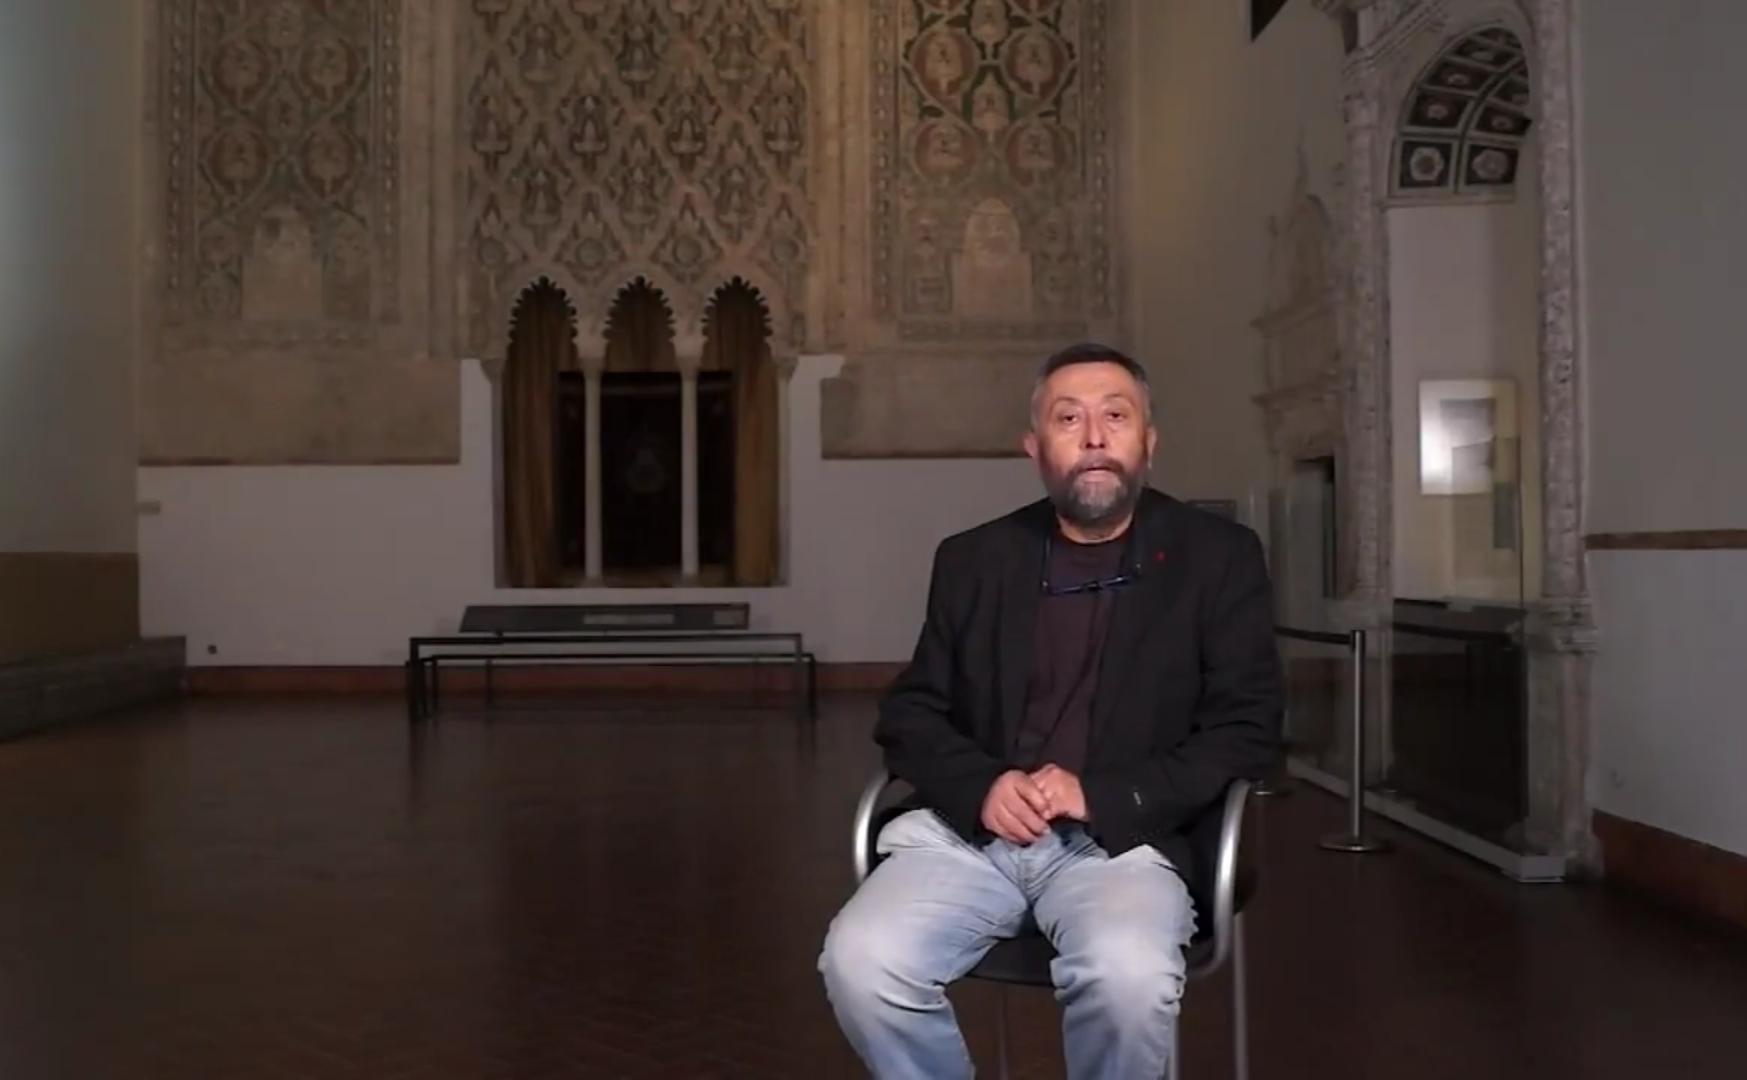 Santiago palomero plaza director of the museo sefardi giving a massive online class in